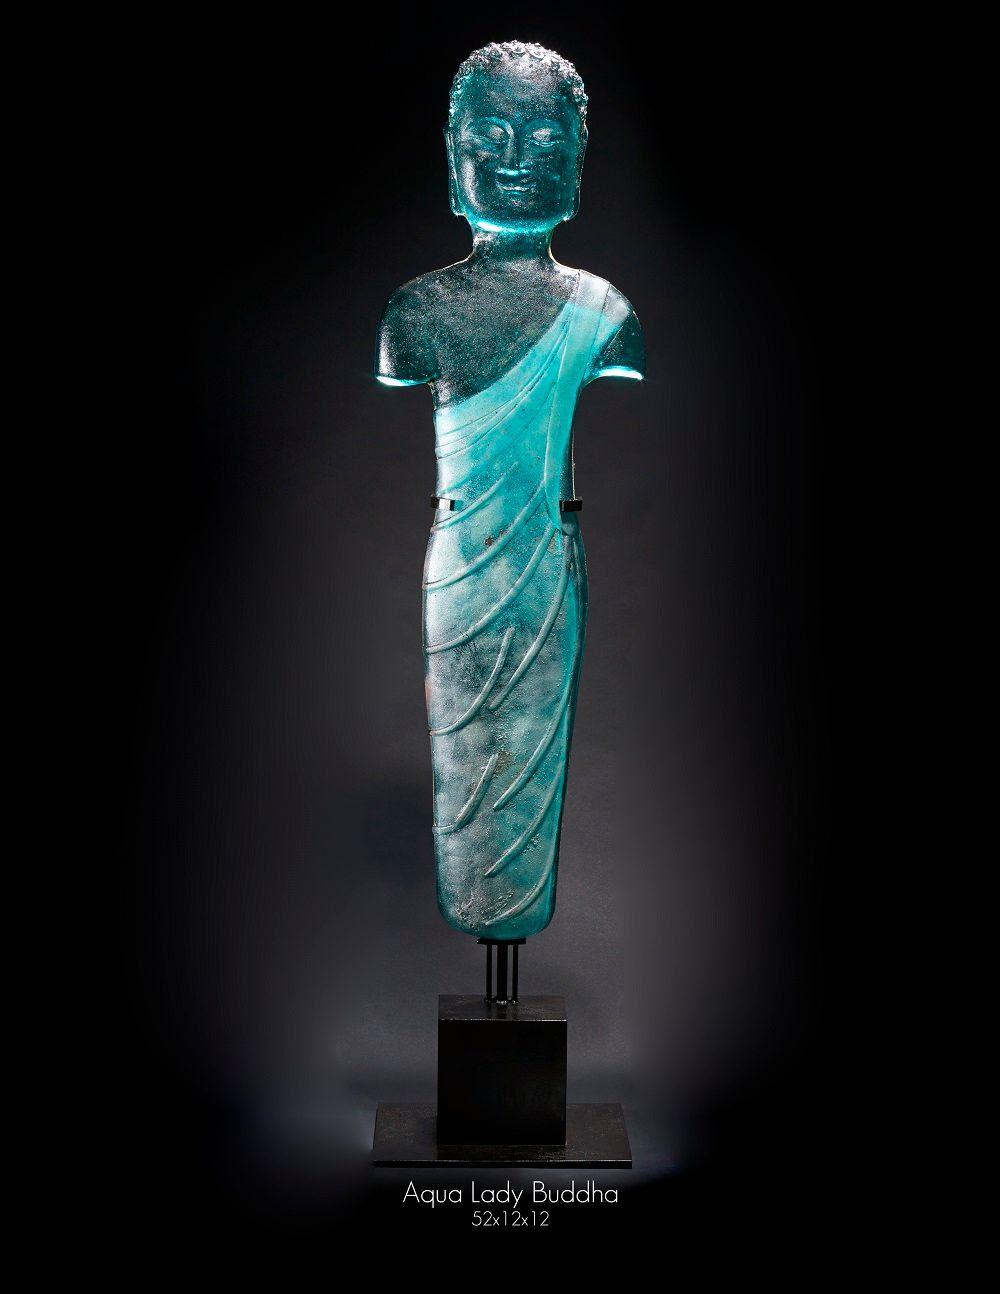 Marlene Rose, Aqua Lady Buddha 52x12x12